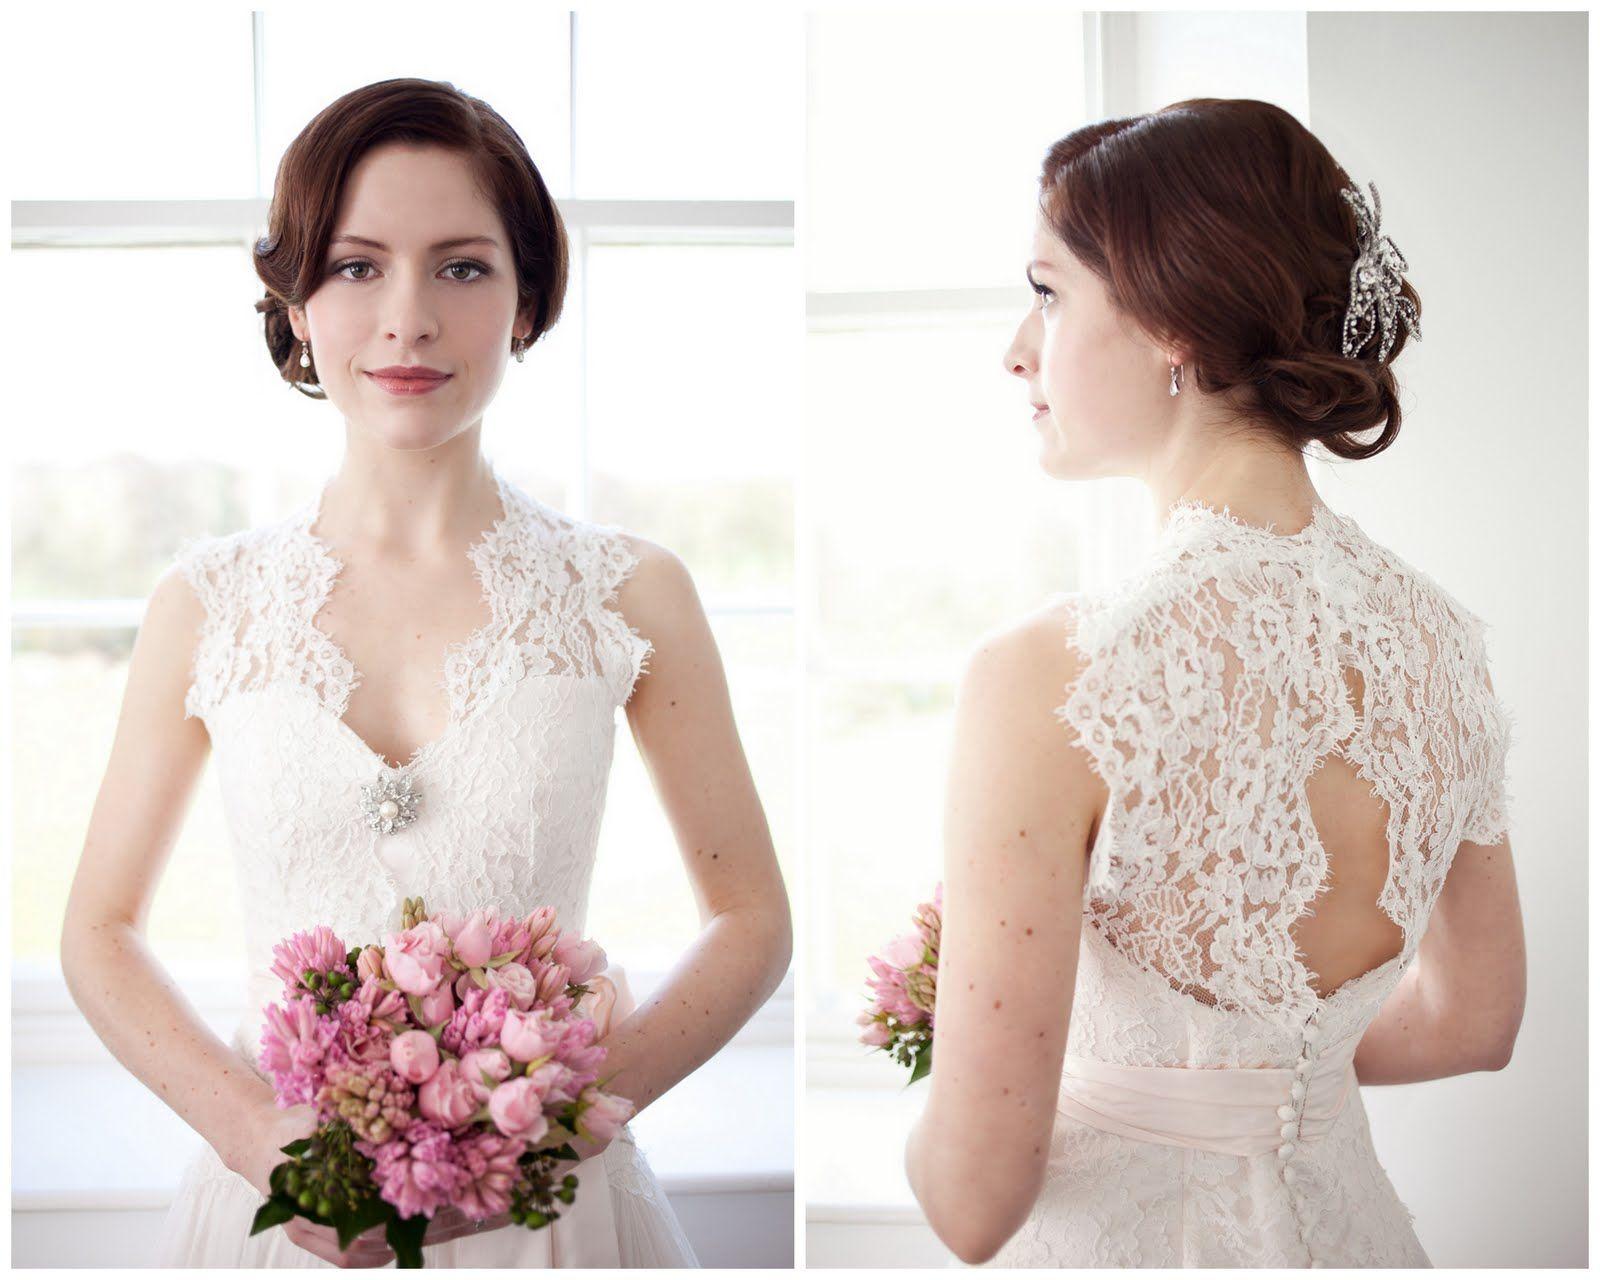 nice light, clean, bright image. Classic bride bridal